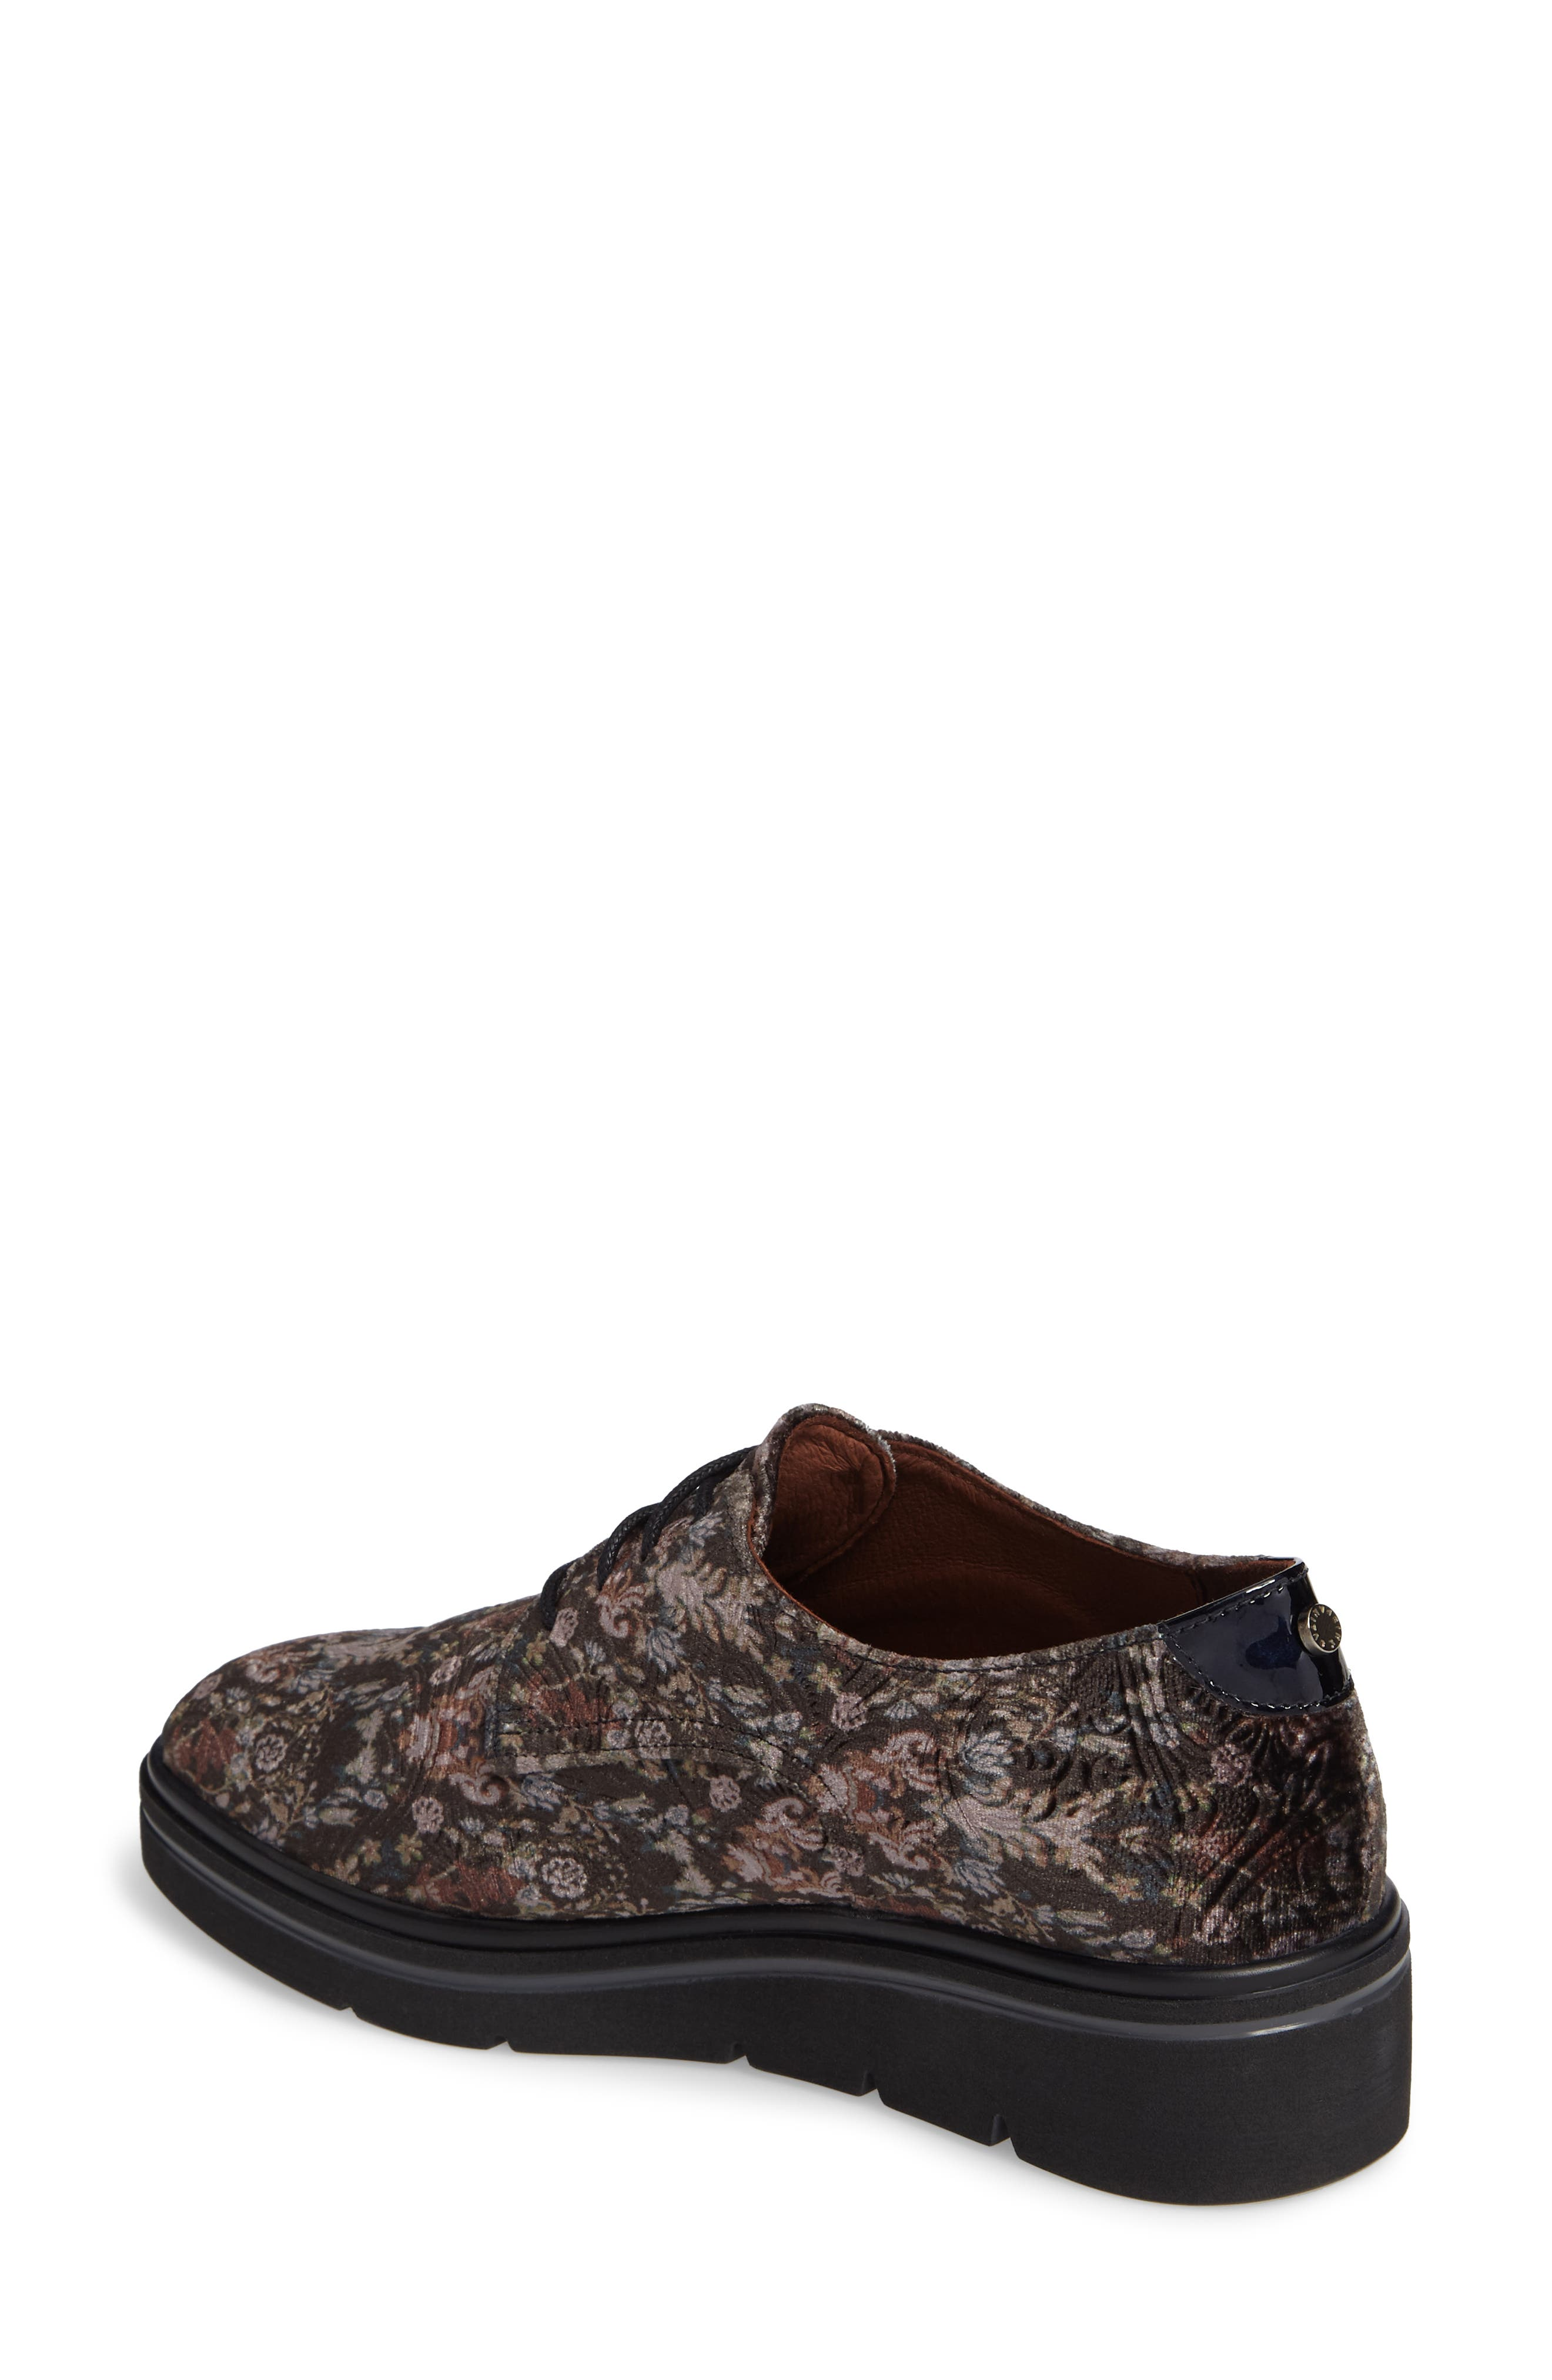 HISPANITAS, Richelle Oxford Sneaker, Alternate thumbnail 2, color, GREY FABRIC